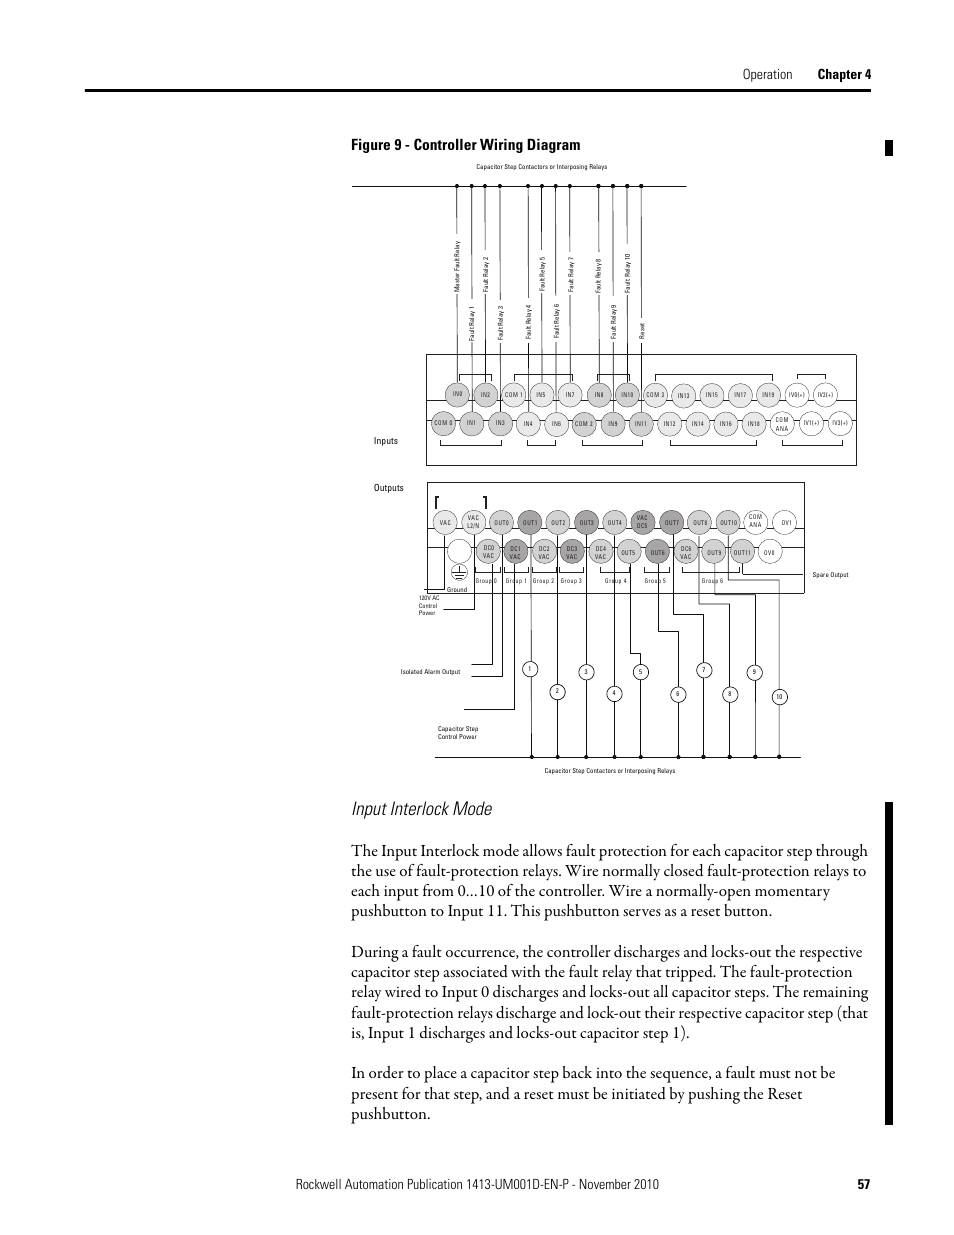 Input interlock mode, Figure 9 - controller wiring diagram | Rockwell  Automation 1413-CAP